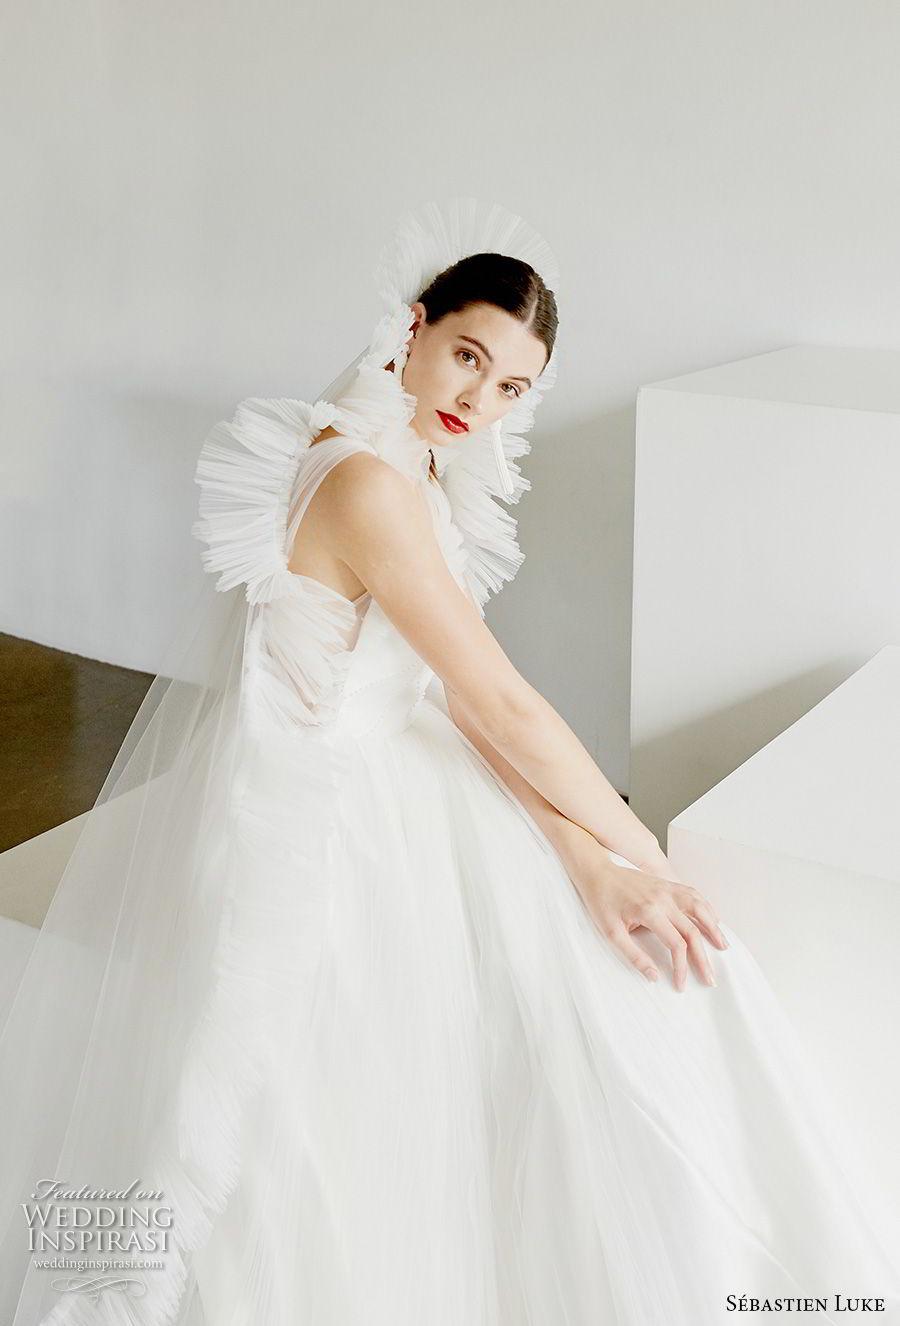 s233bastien luke spring 2019 wedding dresses wedding inspirasi